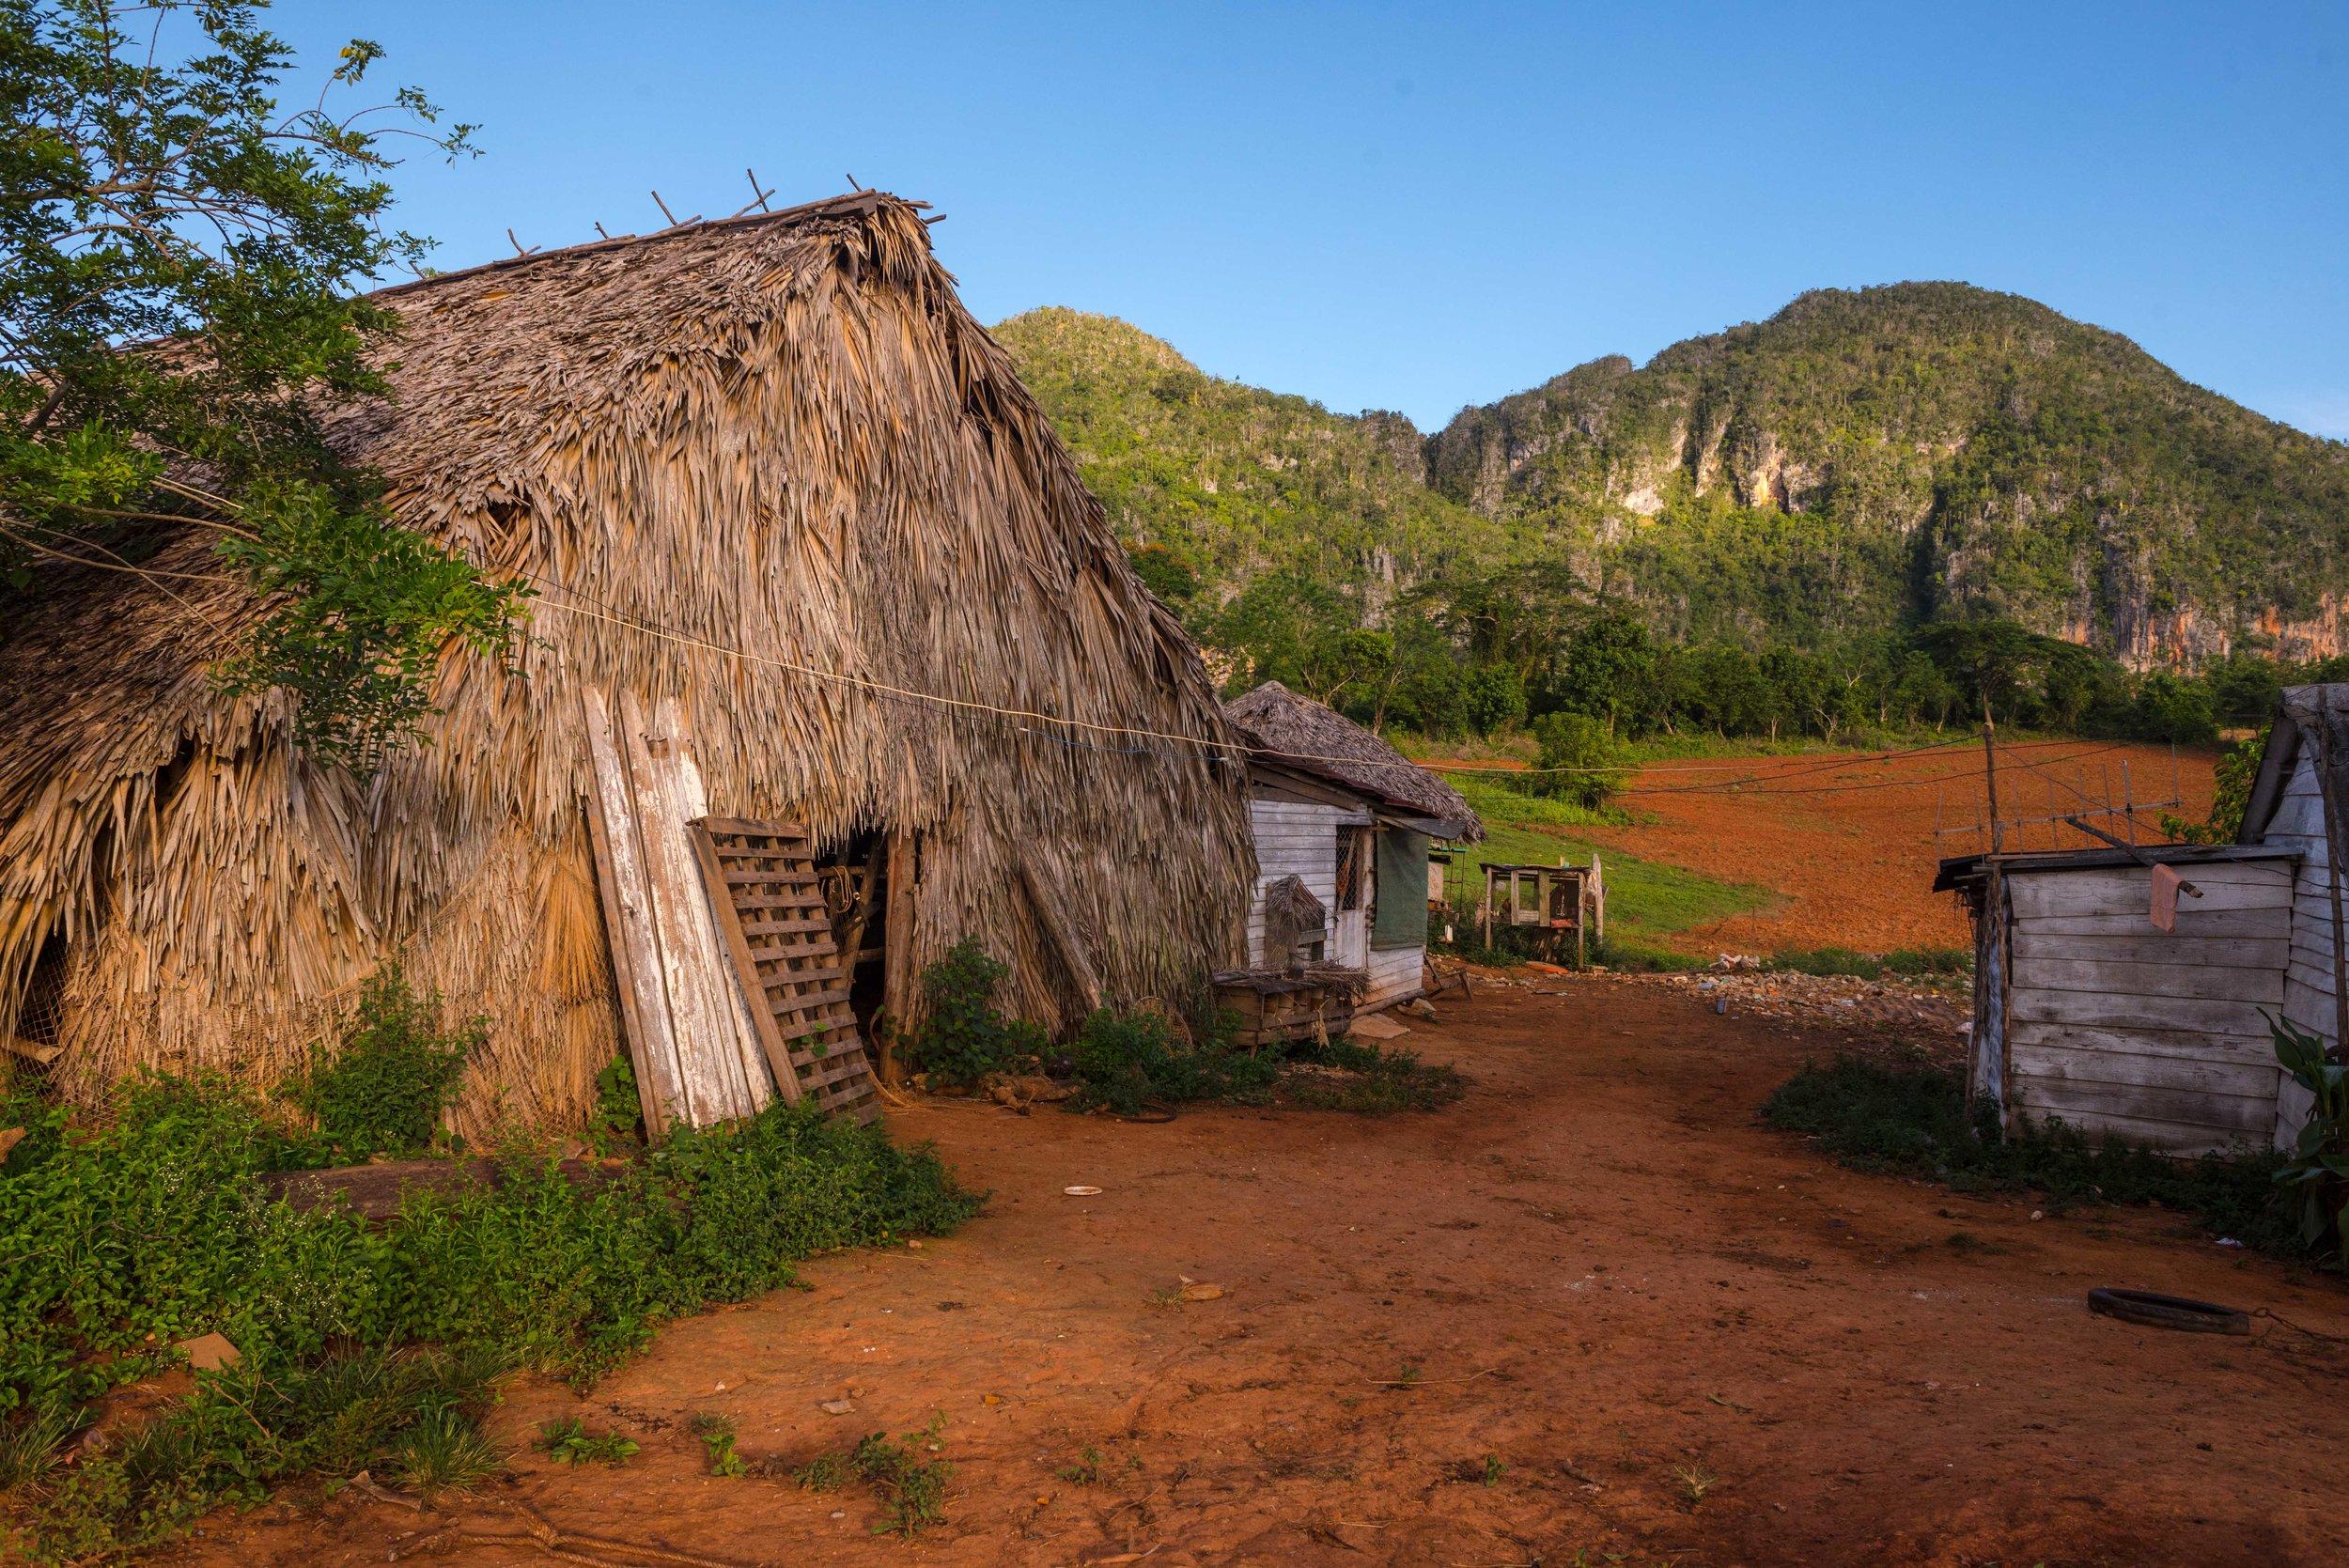 Secadora - traditional tabaco-drying hut.